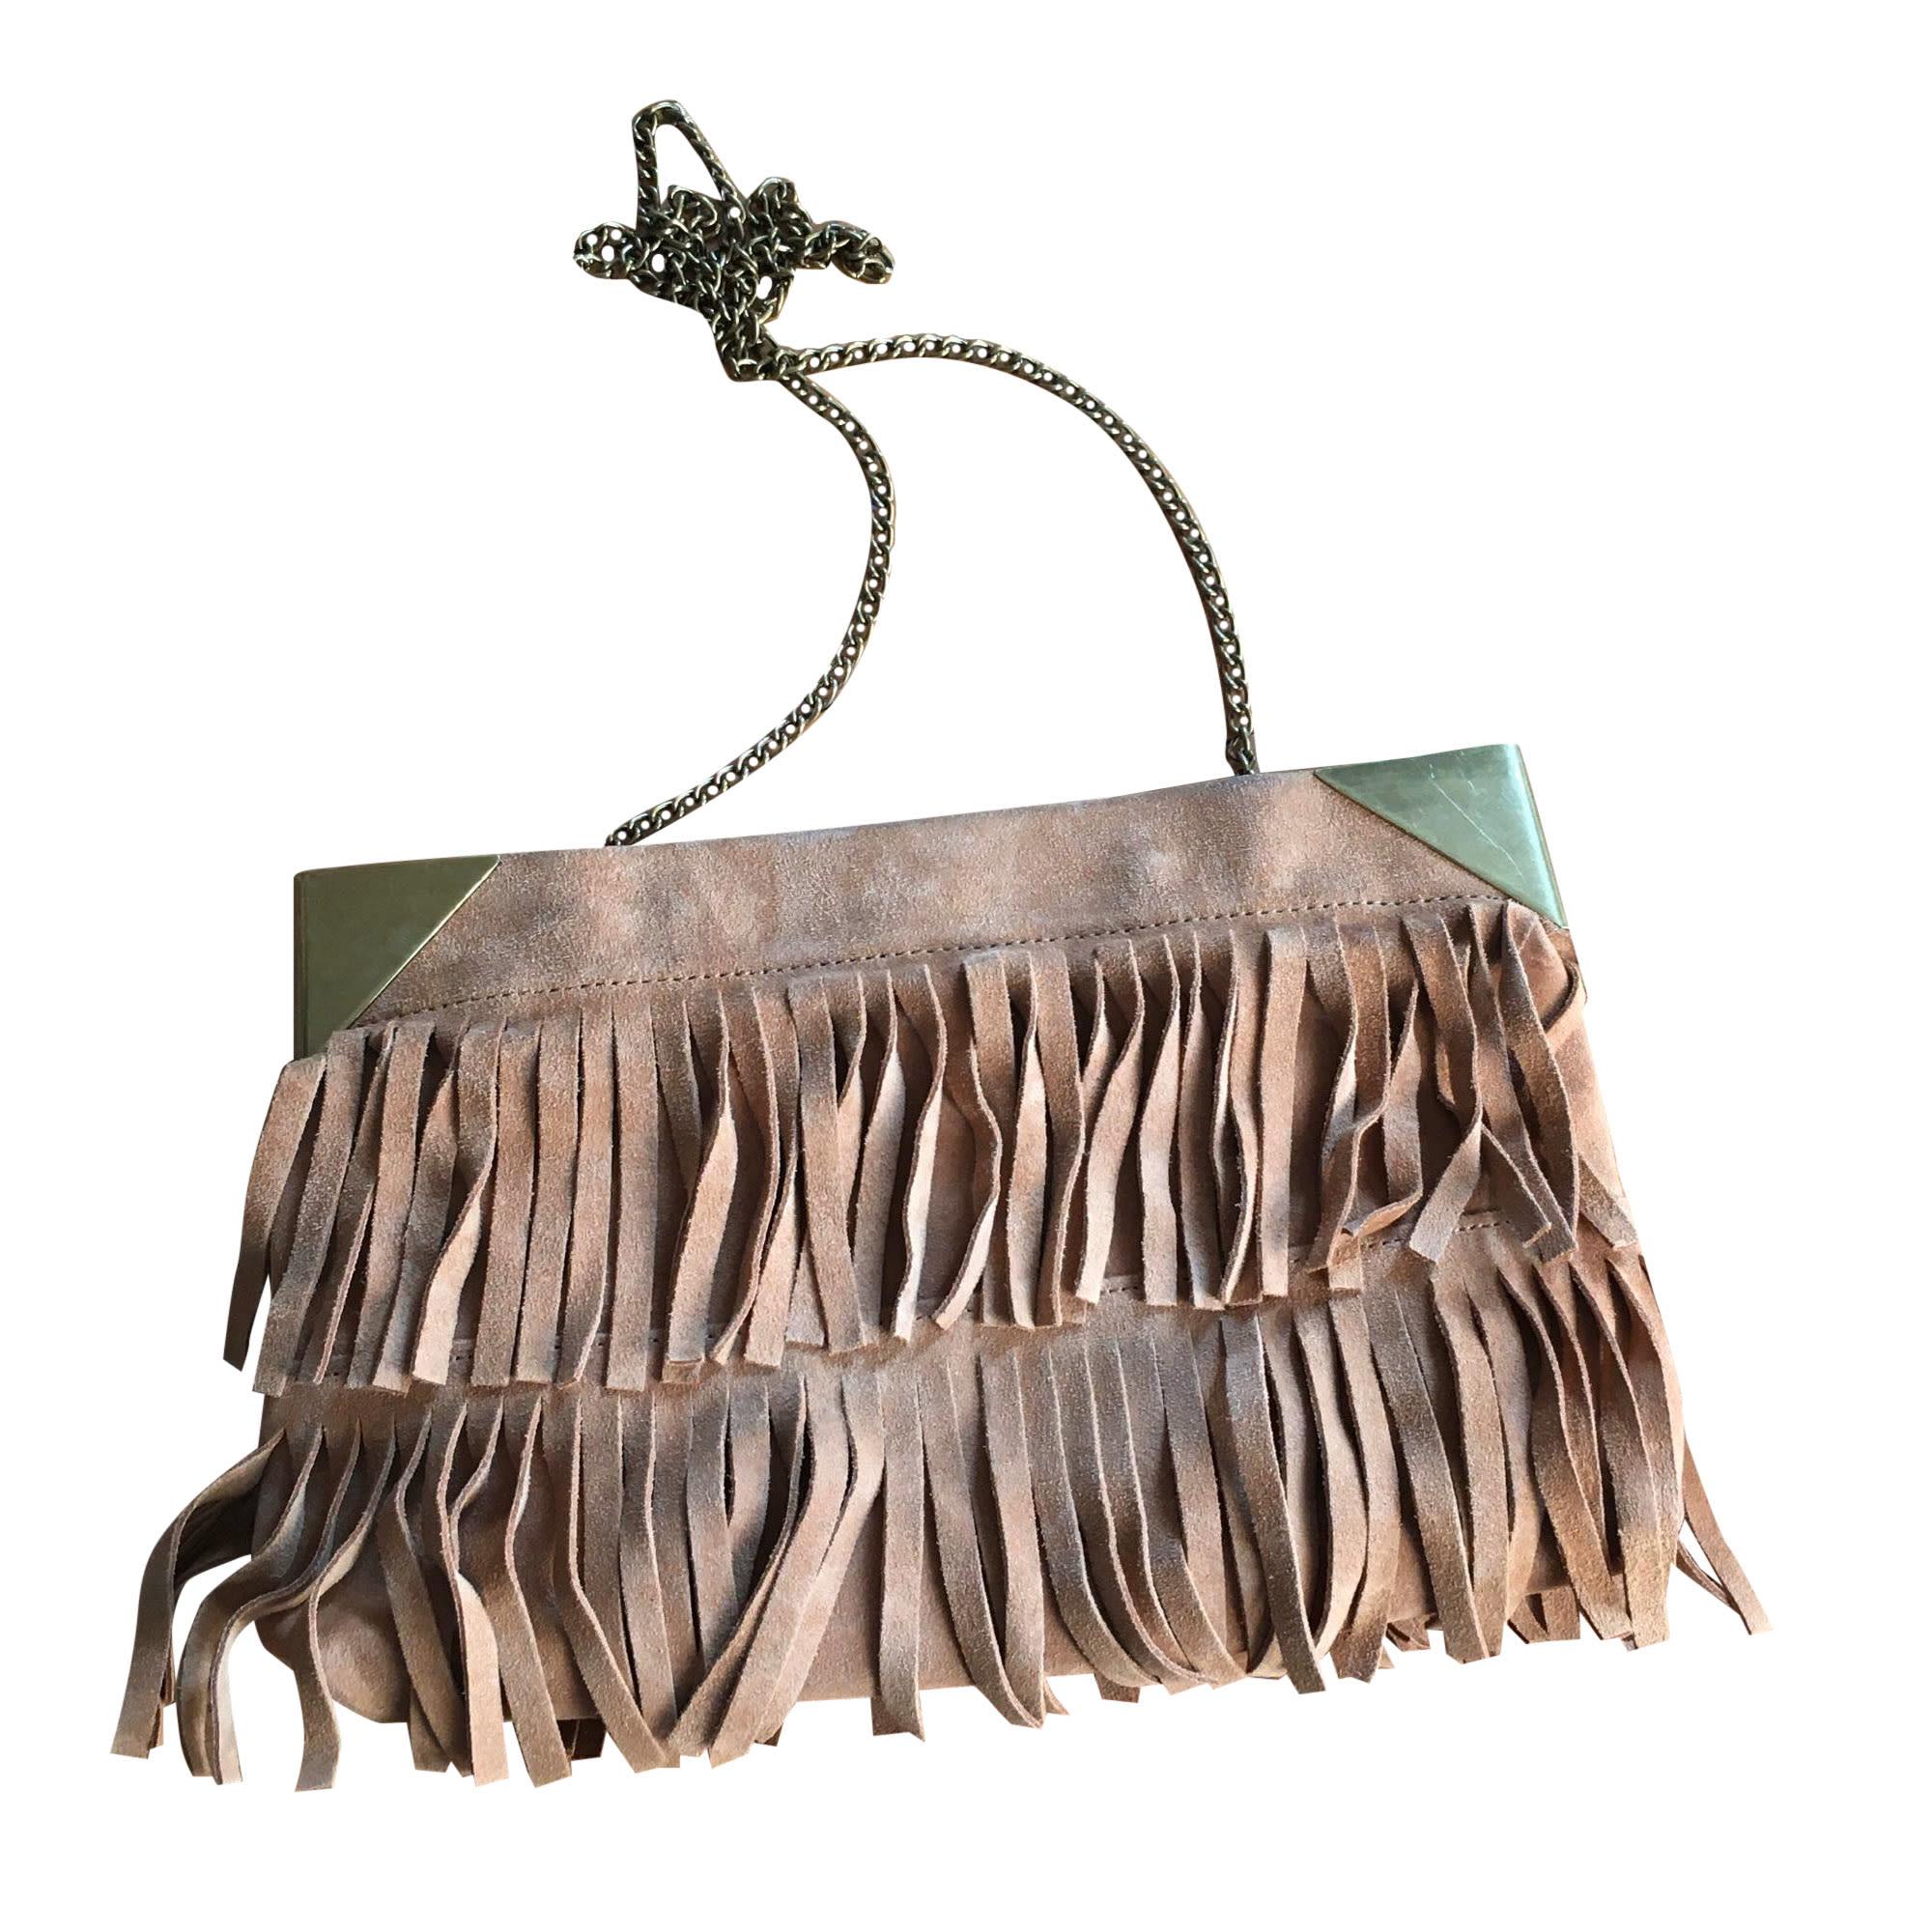 Sac en bandoulière en cuir NAT & NIN Beige, camel